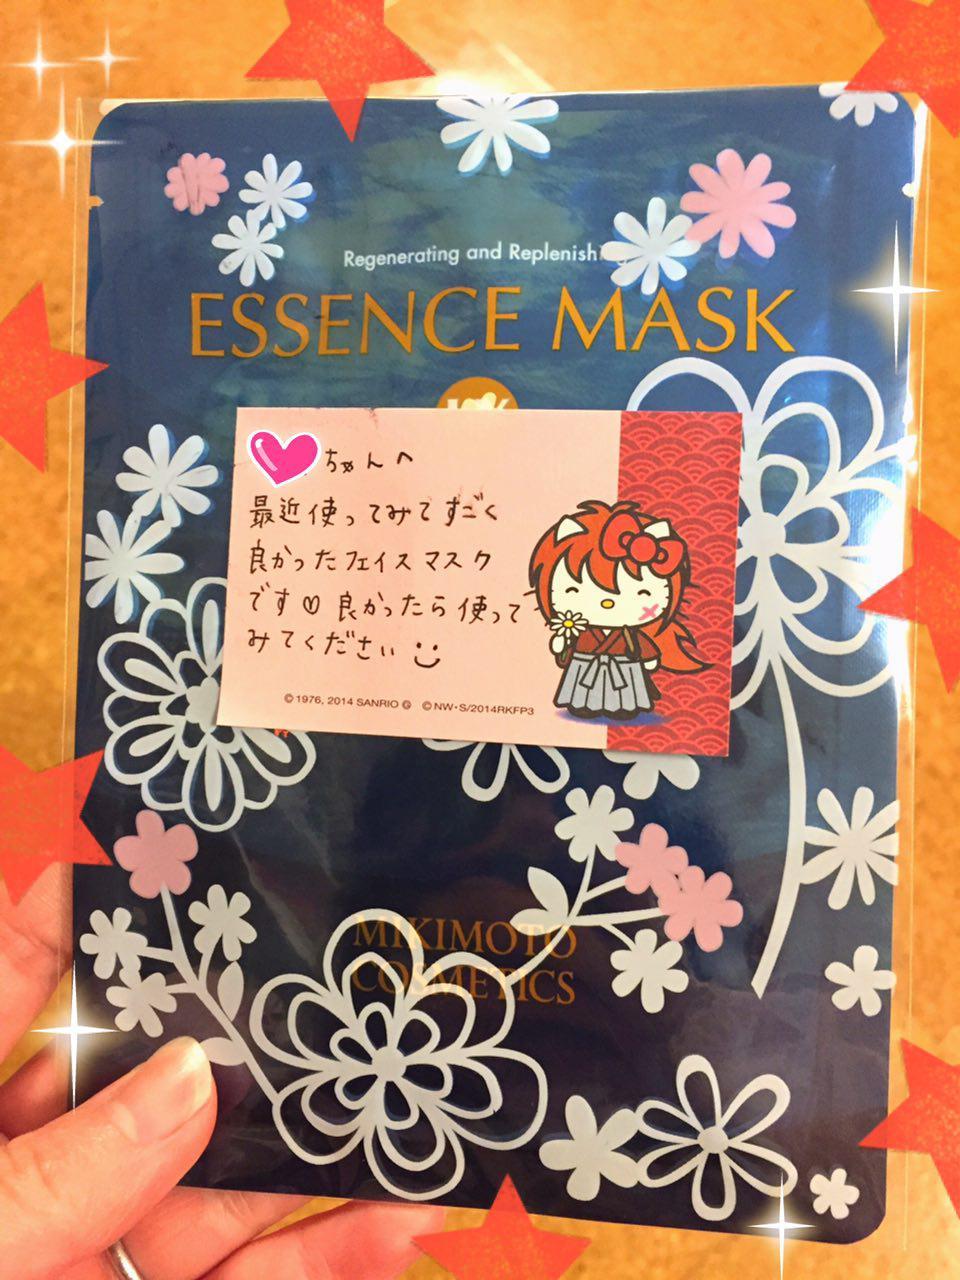 photo_2017-04-26_23-49-34.jpg